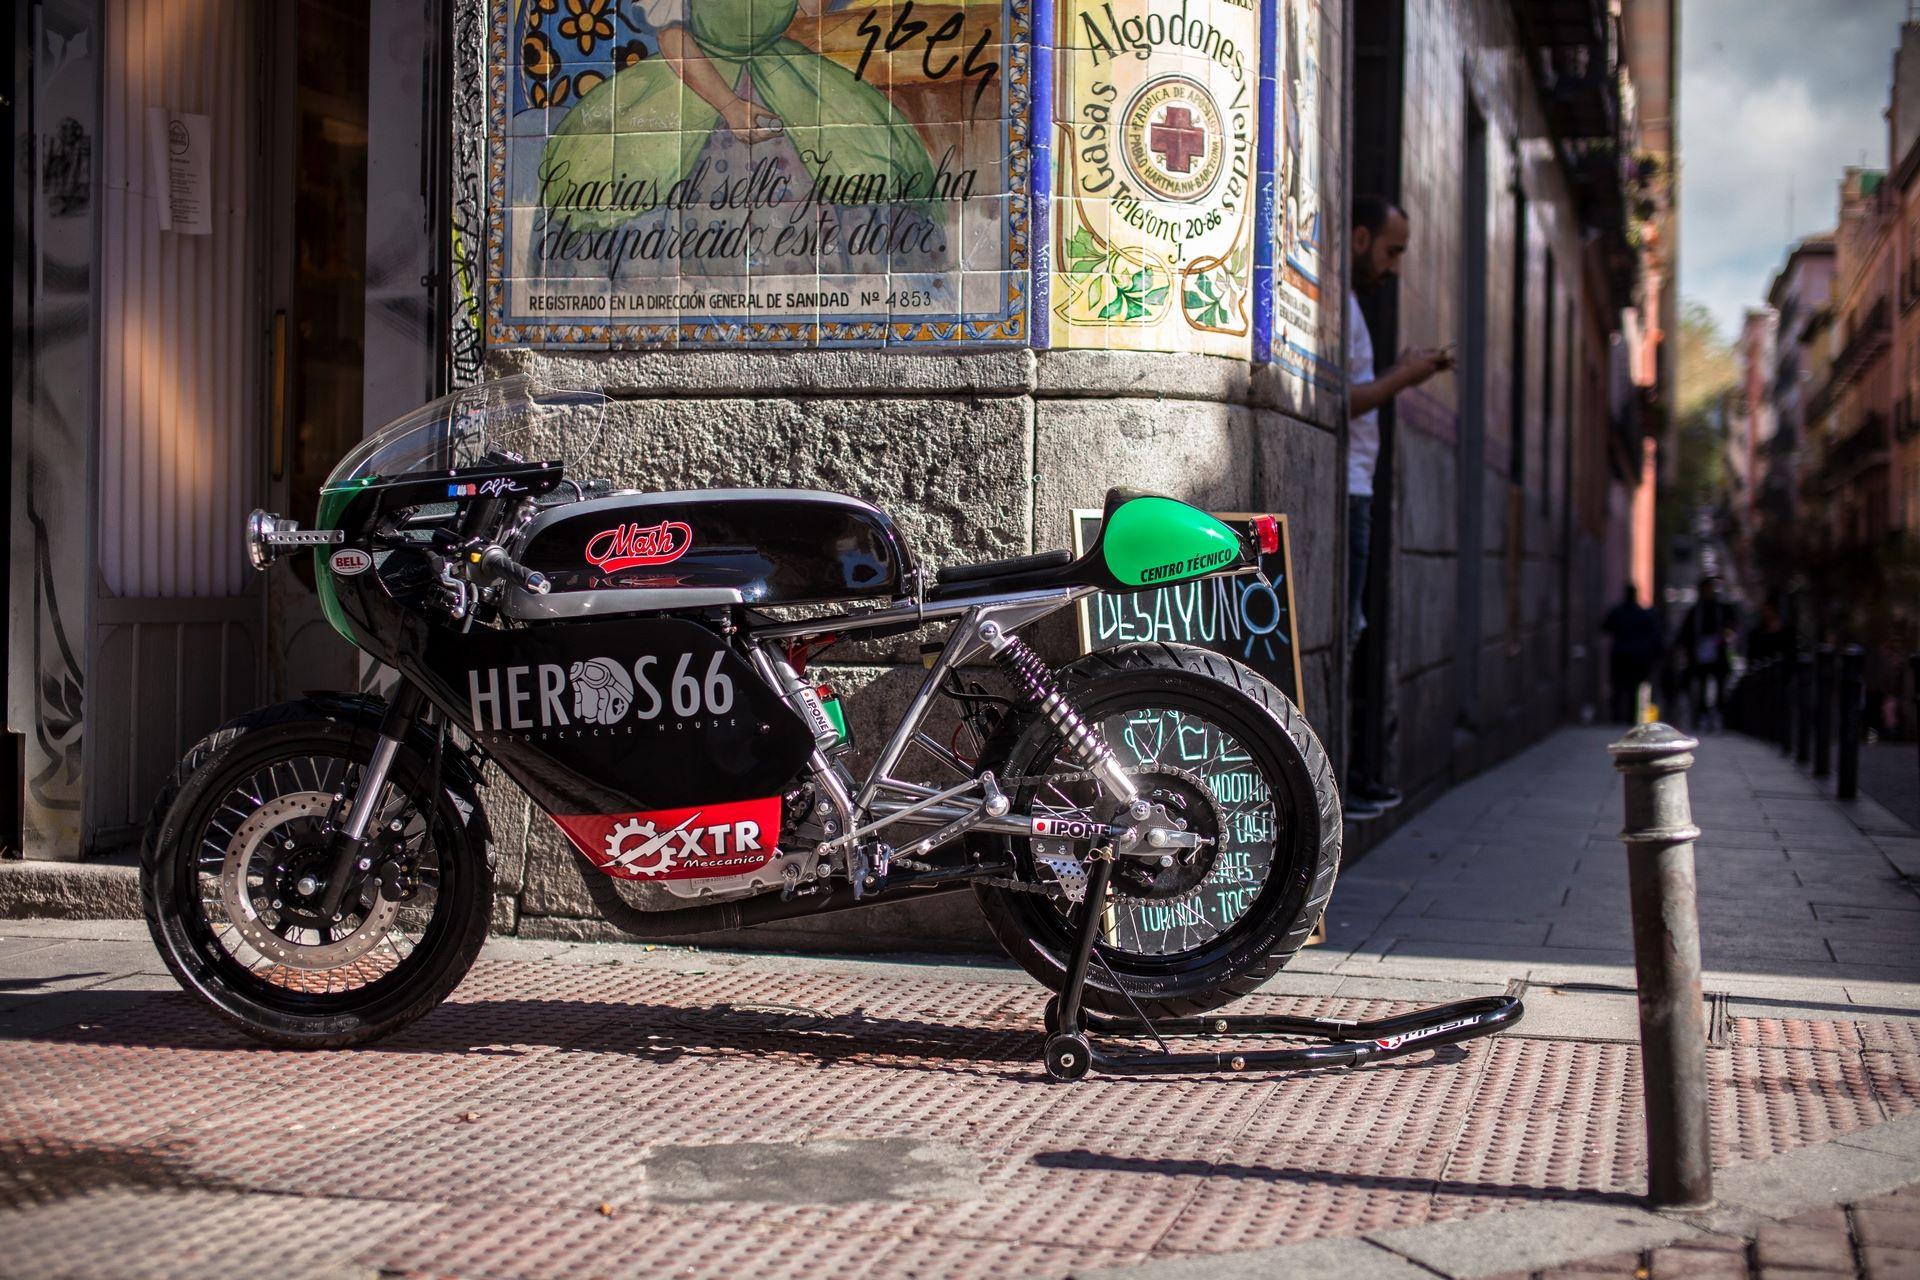 caferaceros - motos cafe racer, scrambler, brat, bobber, tracker